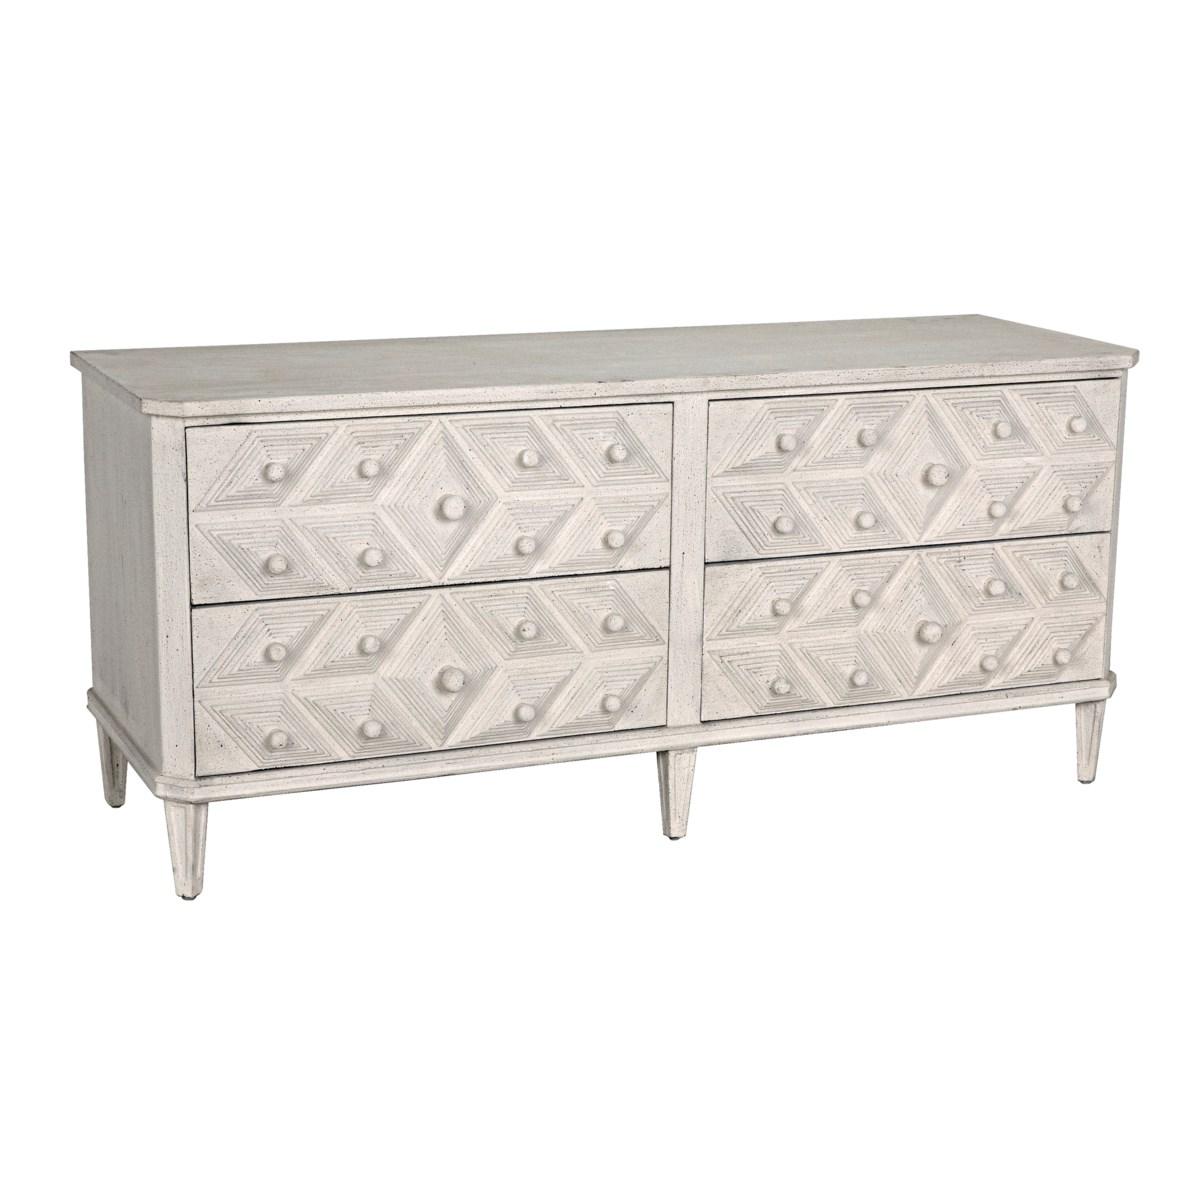 Giza 4 Drawer Dresser, White Weathered